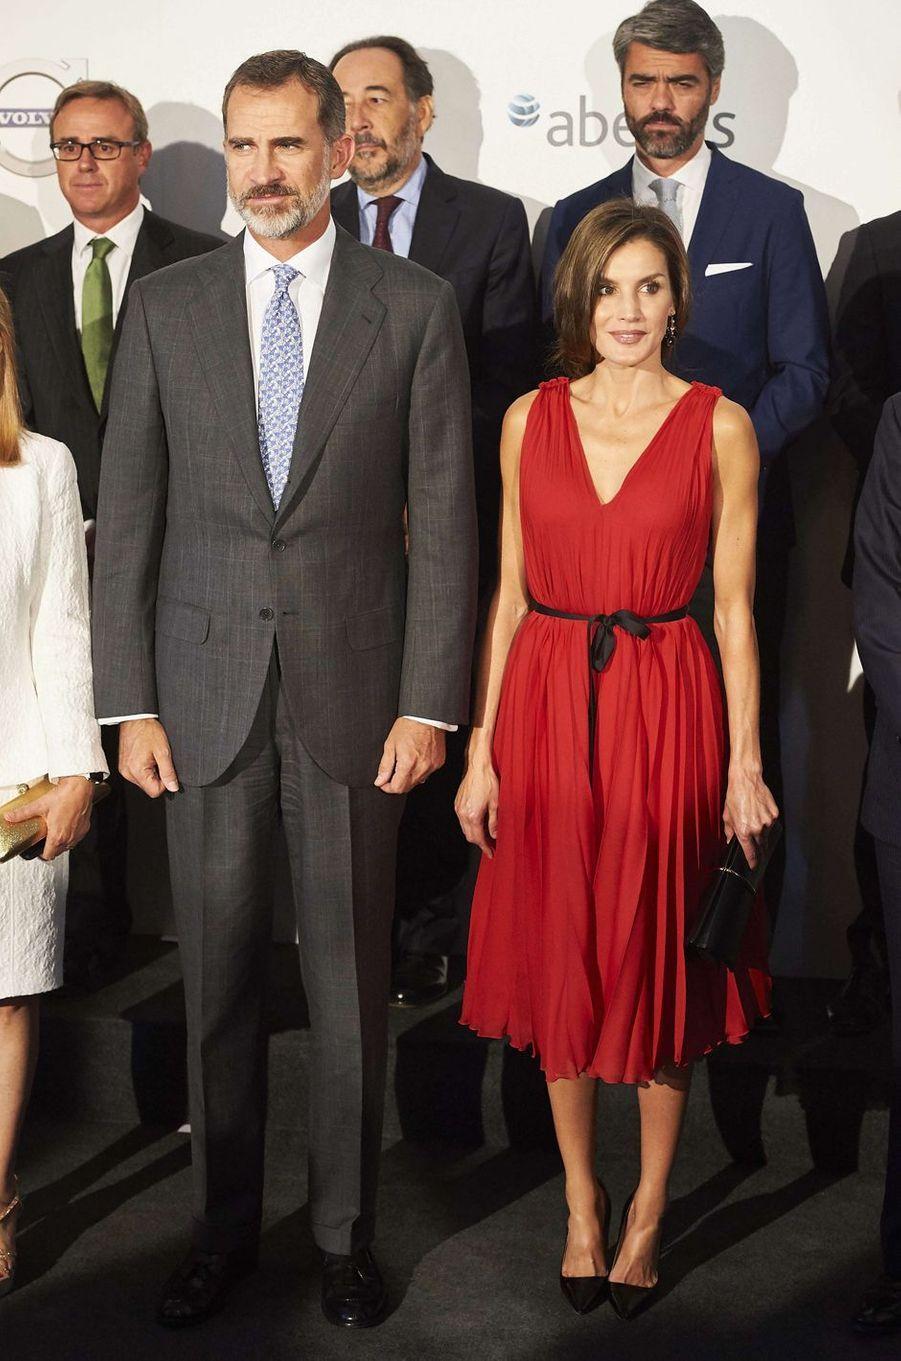 La reine Letizia d'Espagne en Carolina Herrera, le 21 septembre 2017